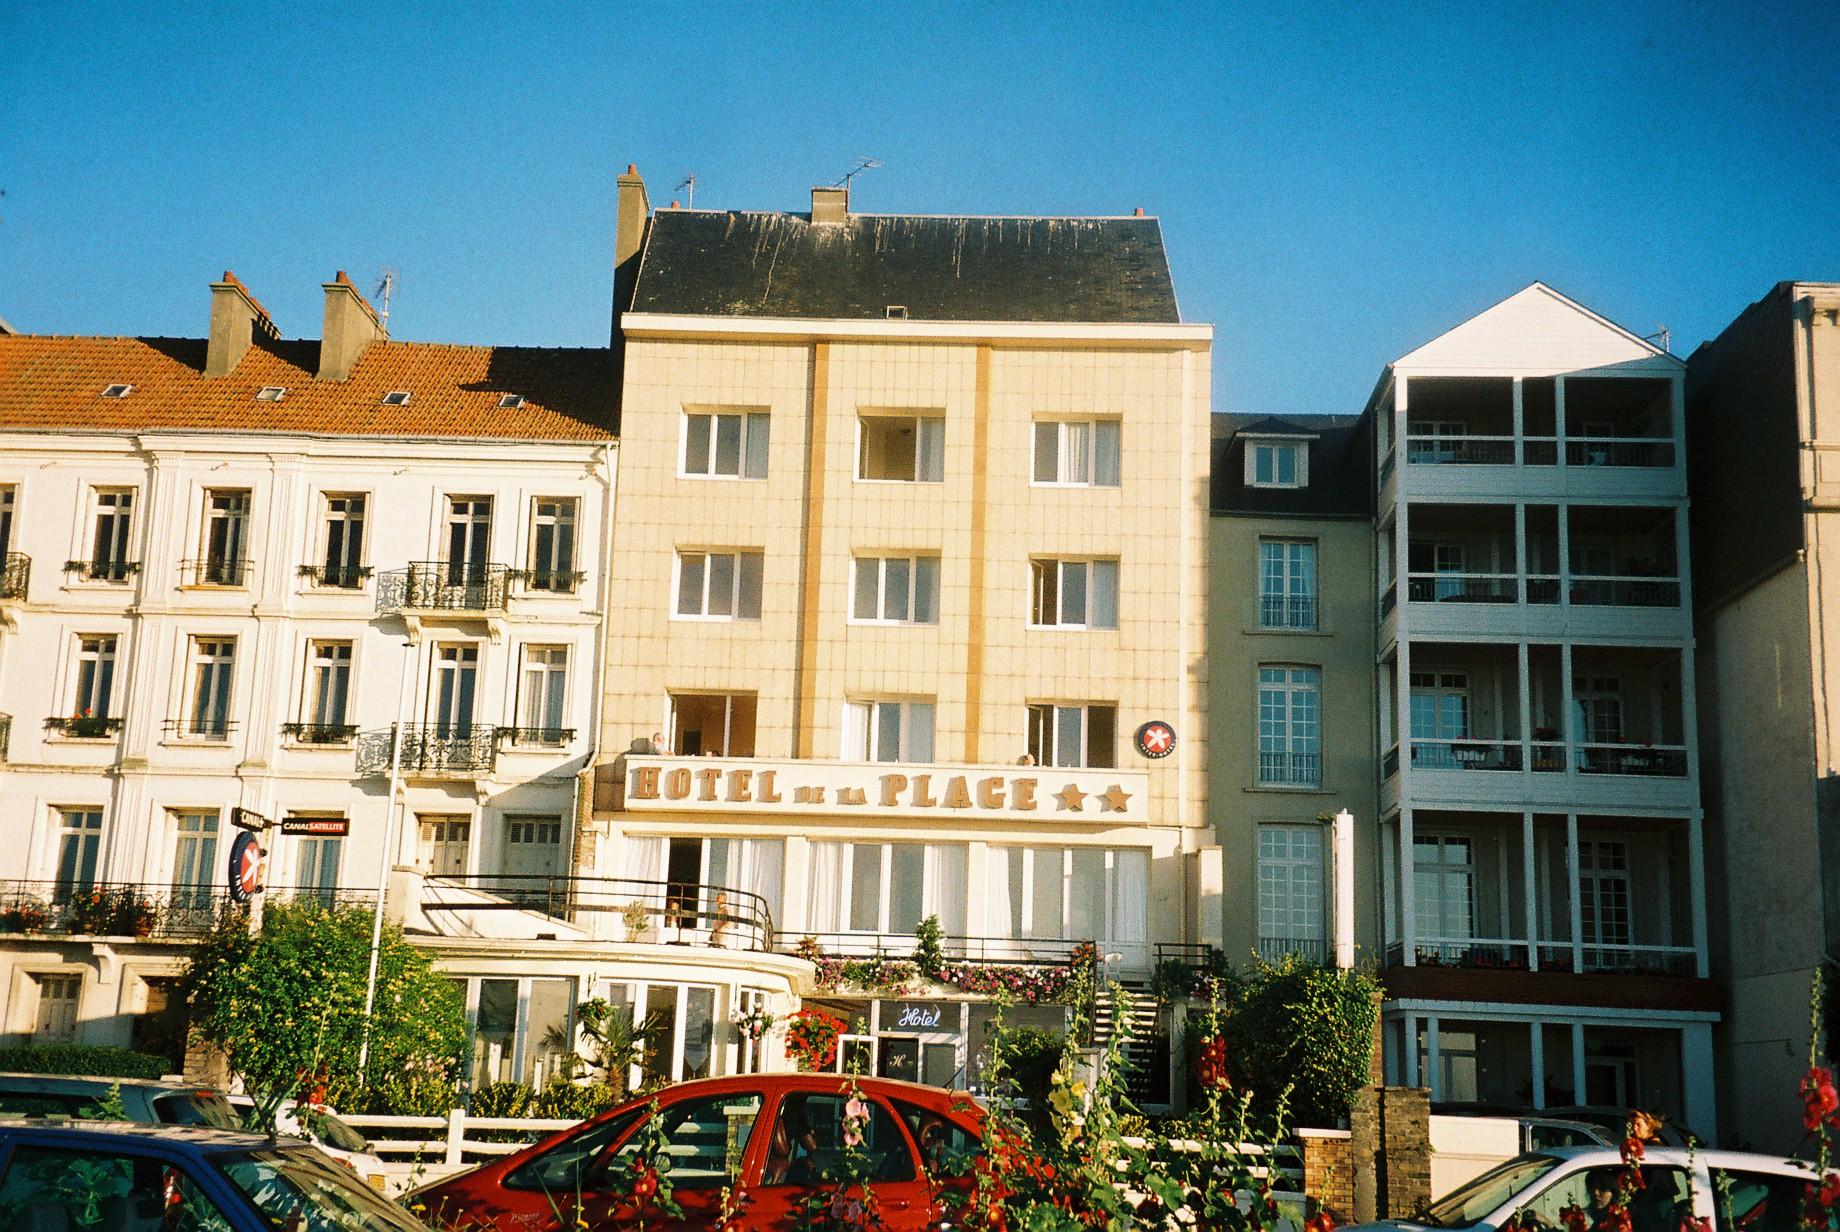 Dieppe hotel de la Plage on bd Verdun sep07